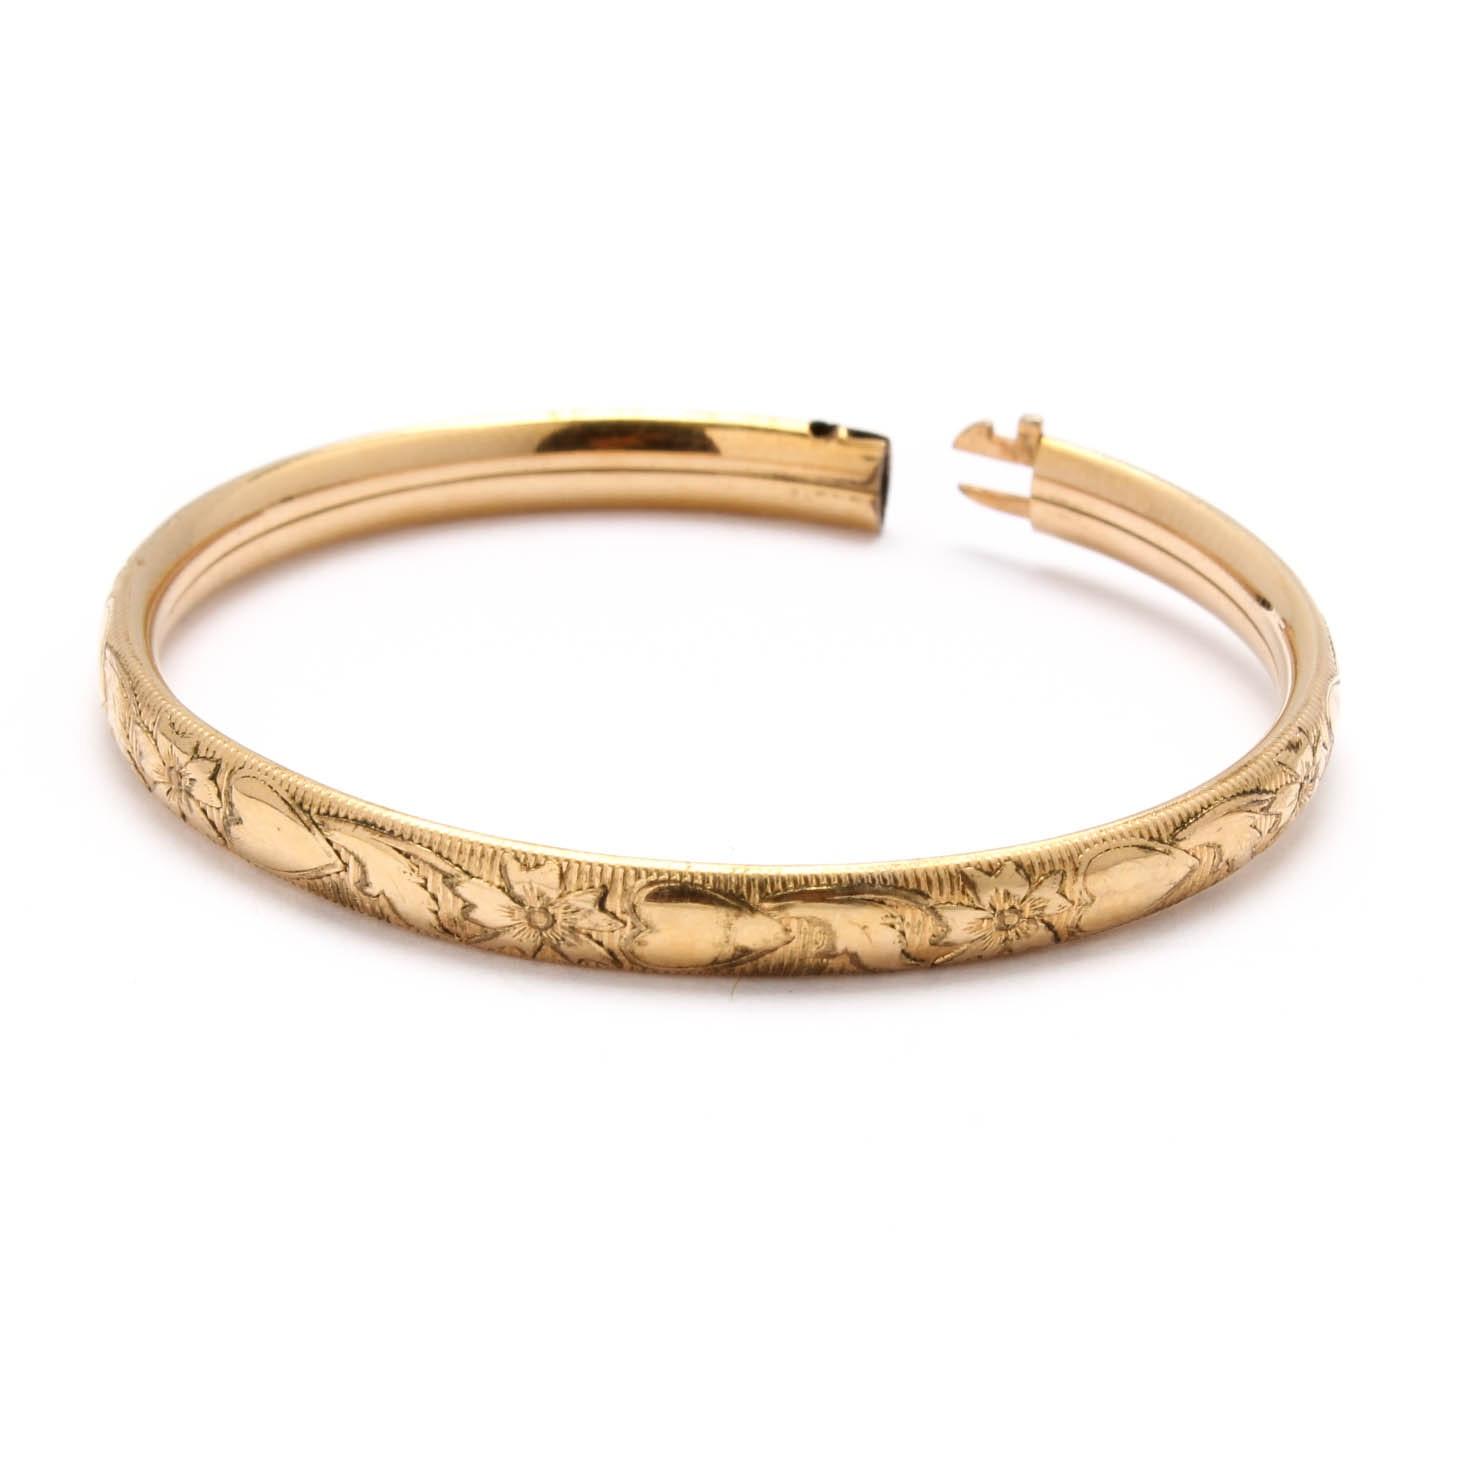 14K Yellow Gold Filled Bracelet